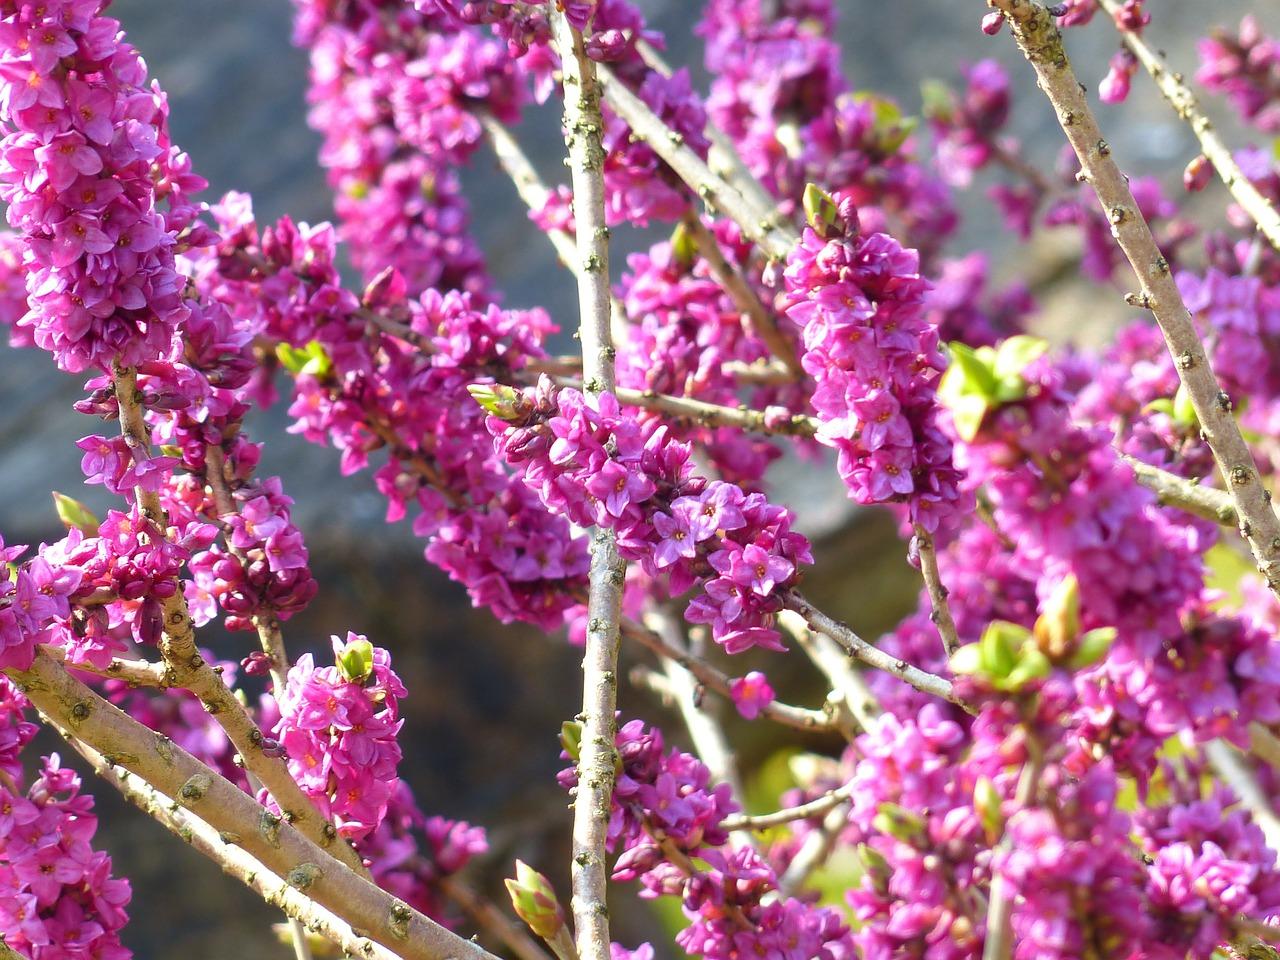 Daphne mezereum - Peperboompje  Hoogte: 80 - 120 cm  Kleur: Paars  Wintergroen: Nee  Bloeiperiode: April - September